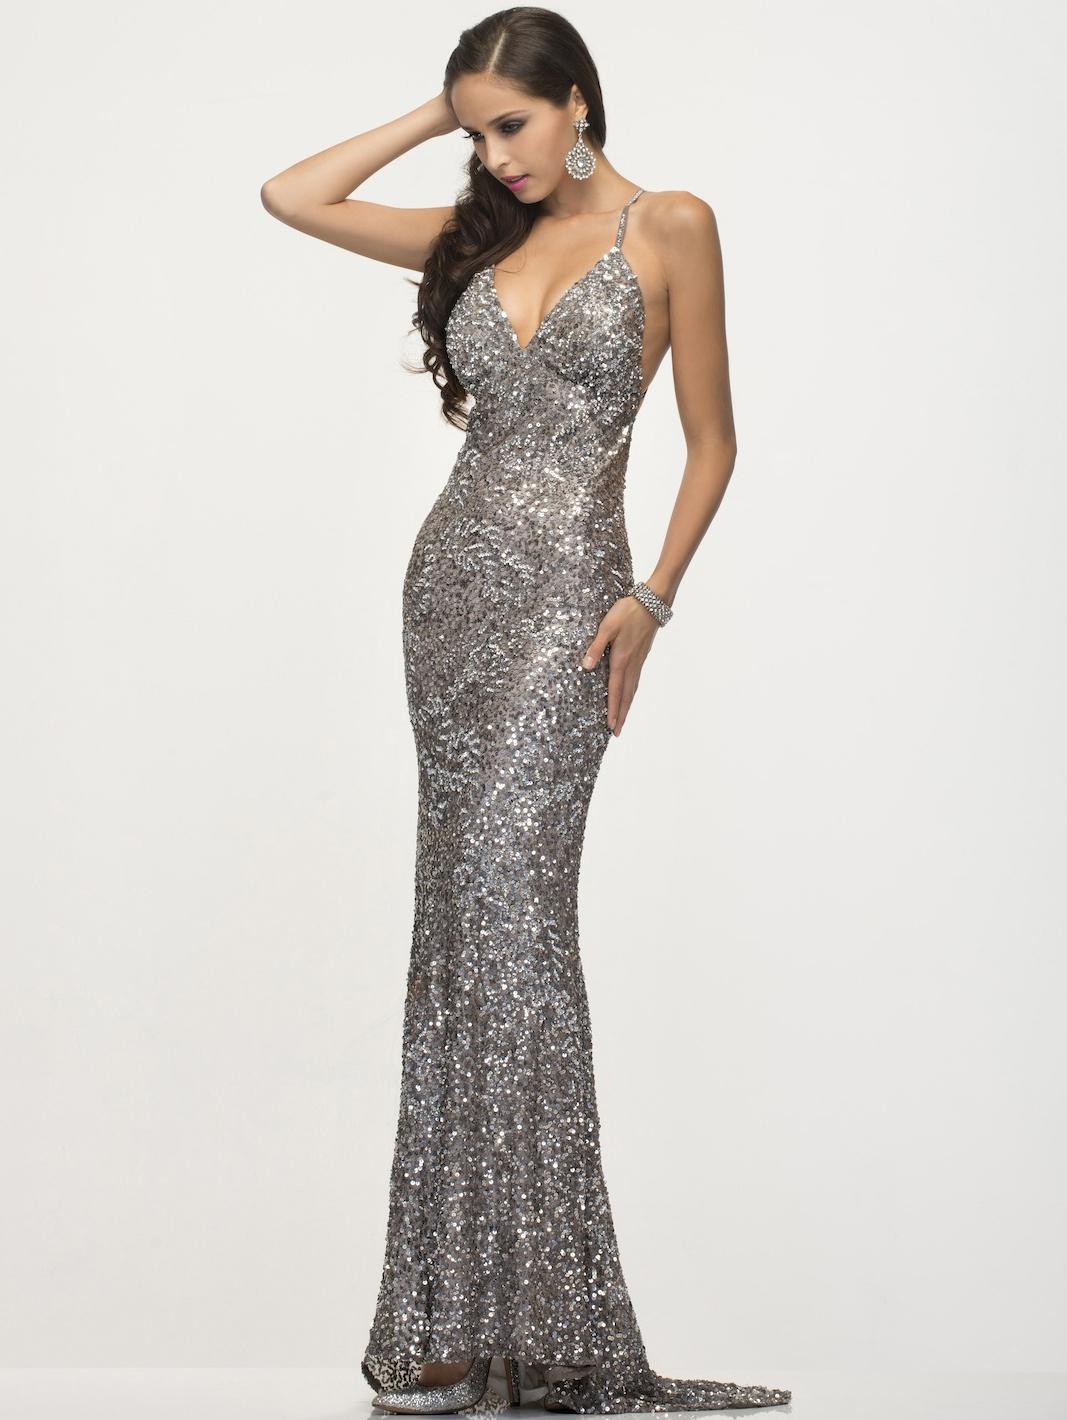 Scala Prom Dresses